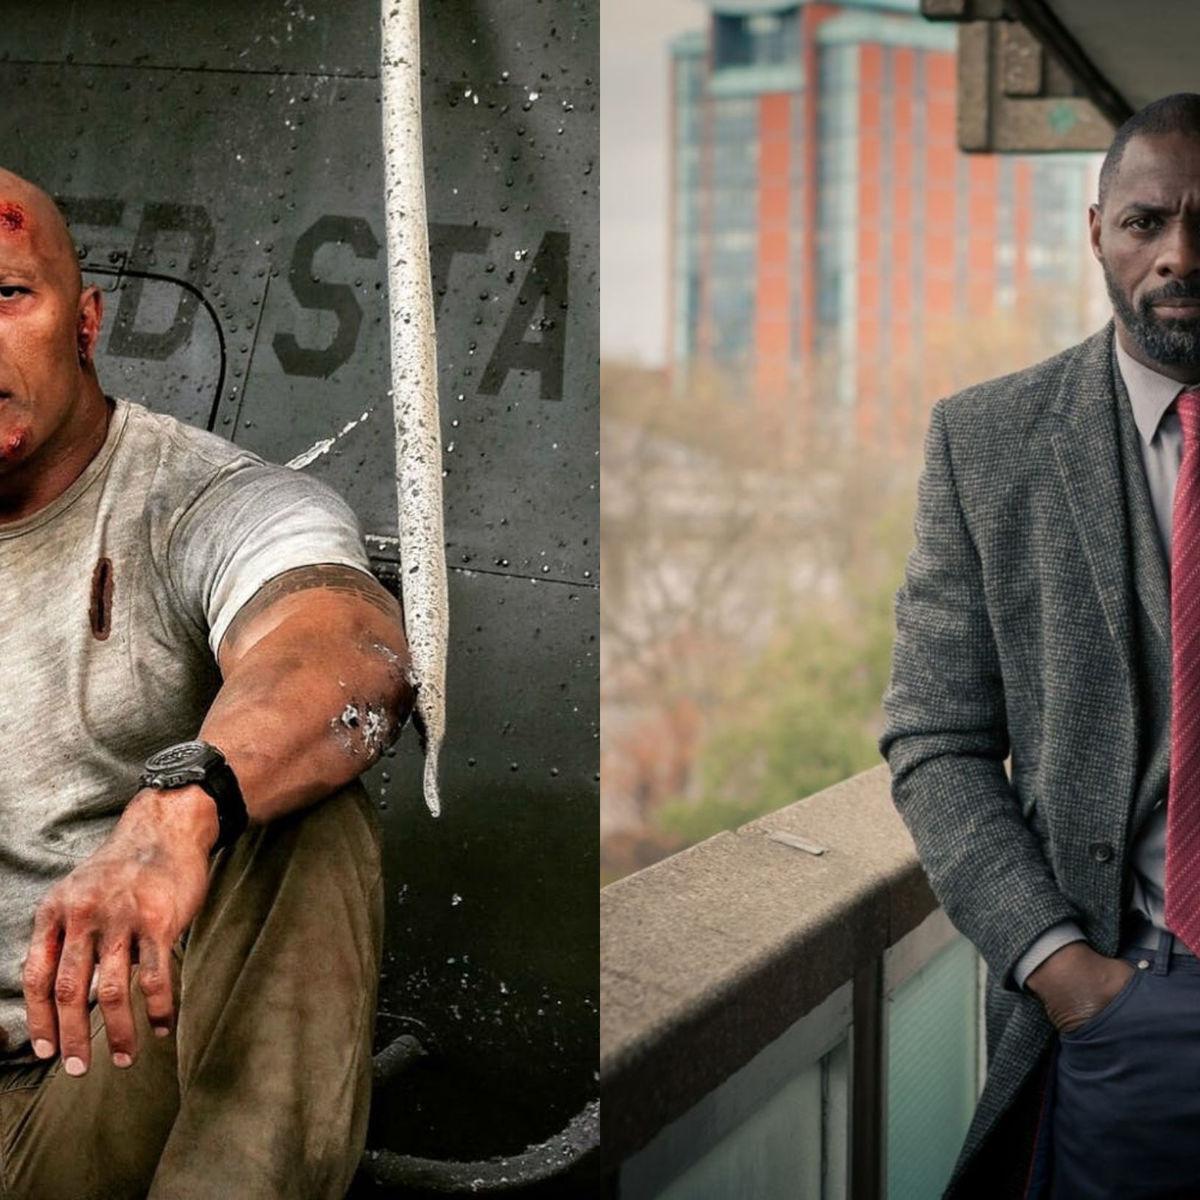 The Rock vs. Idris Elba, Fast and Furious